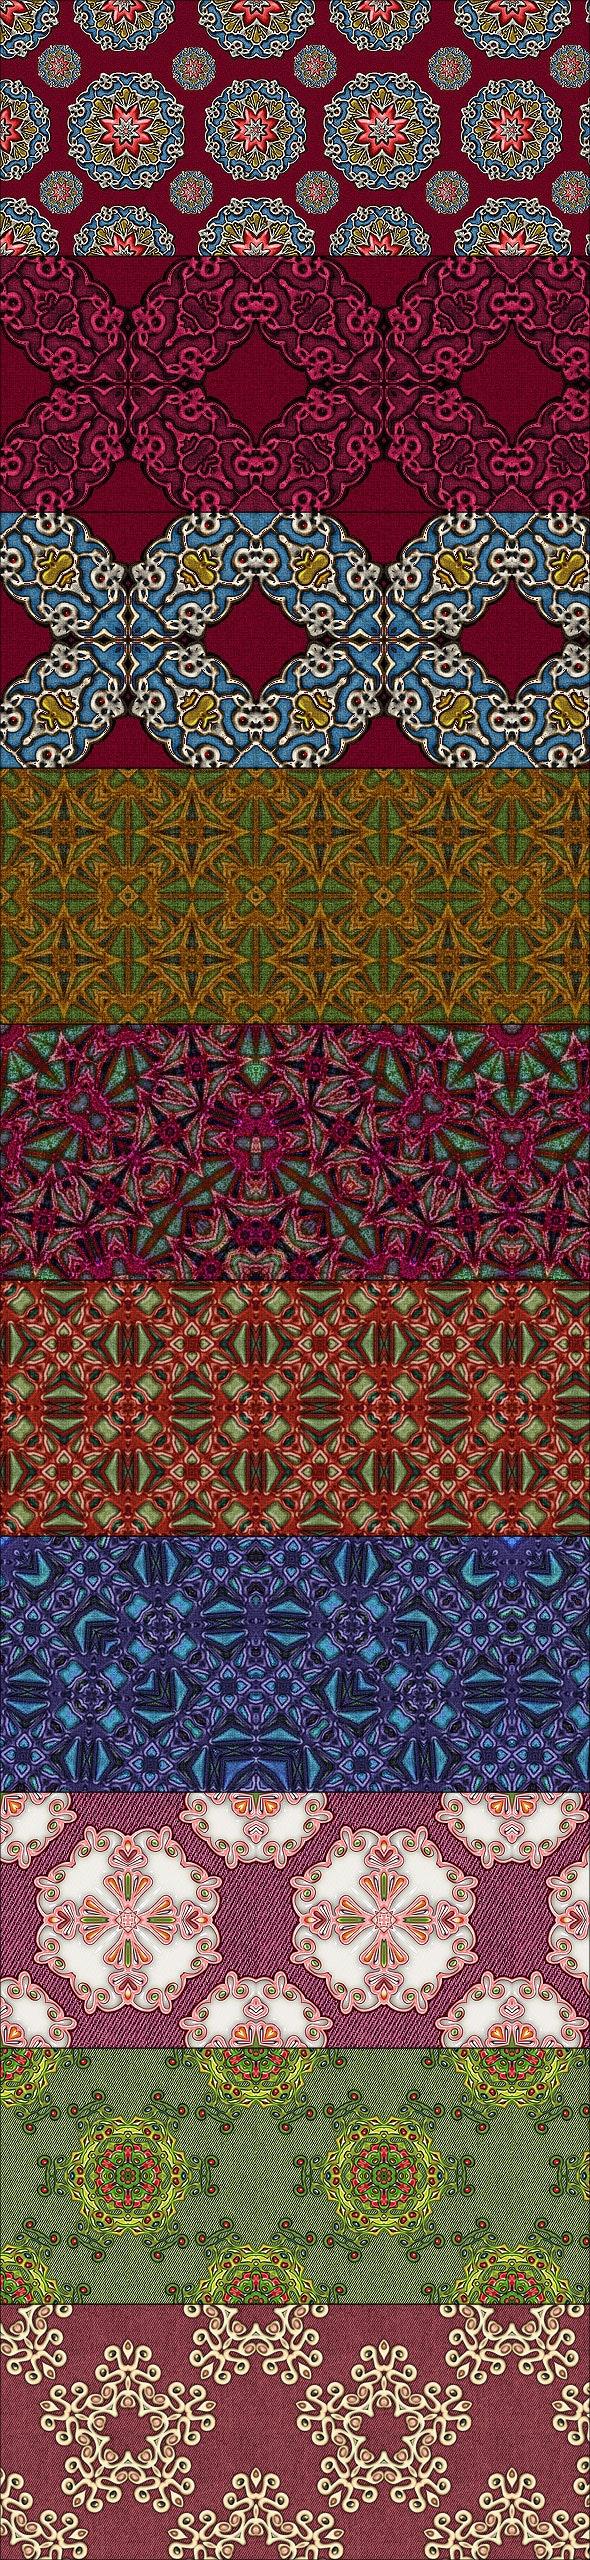 Harem Sundries Fabrics - Miscellaneous Textures / Fills / Patterns